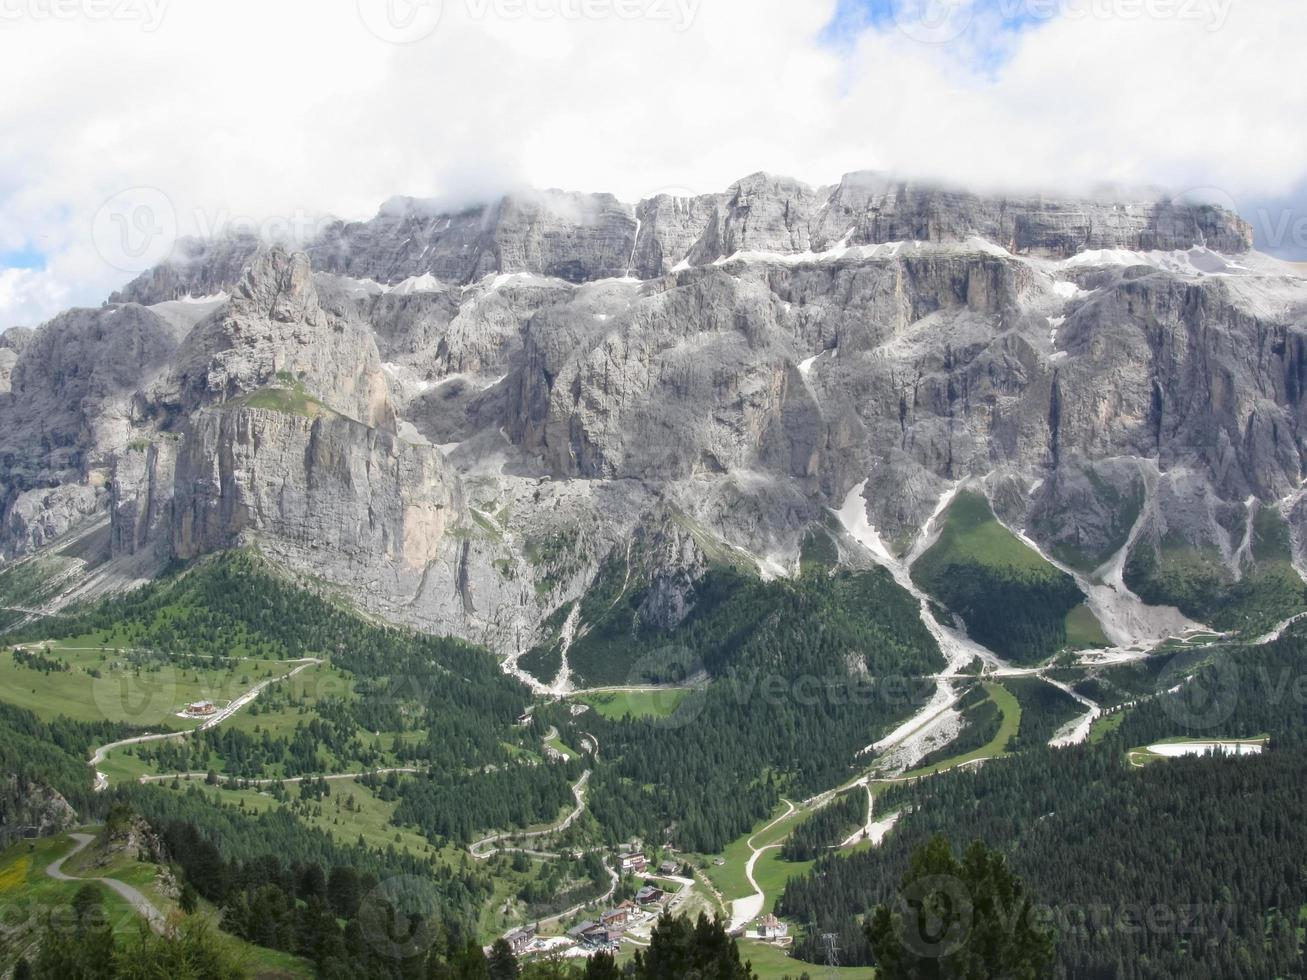 Panoramic mountain view photo